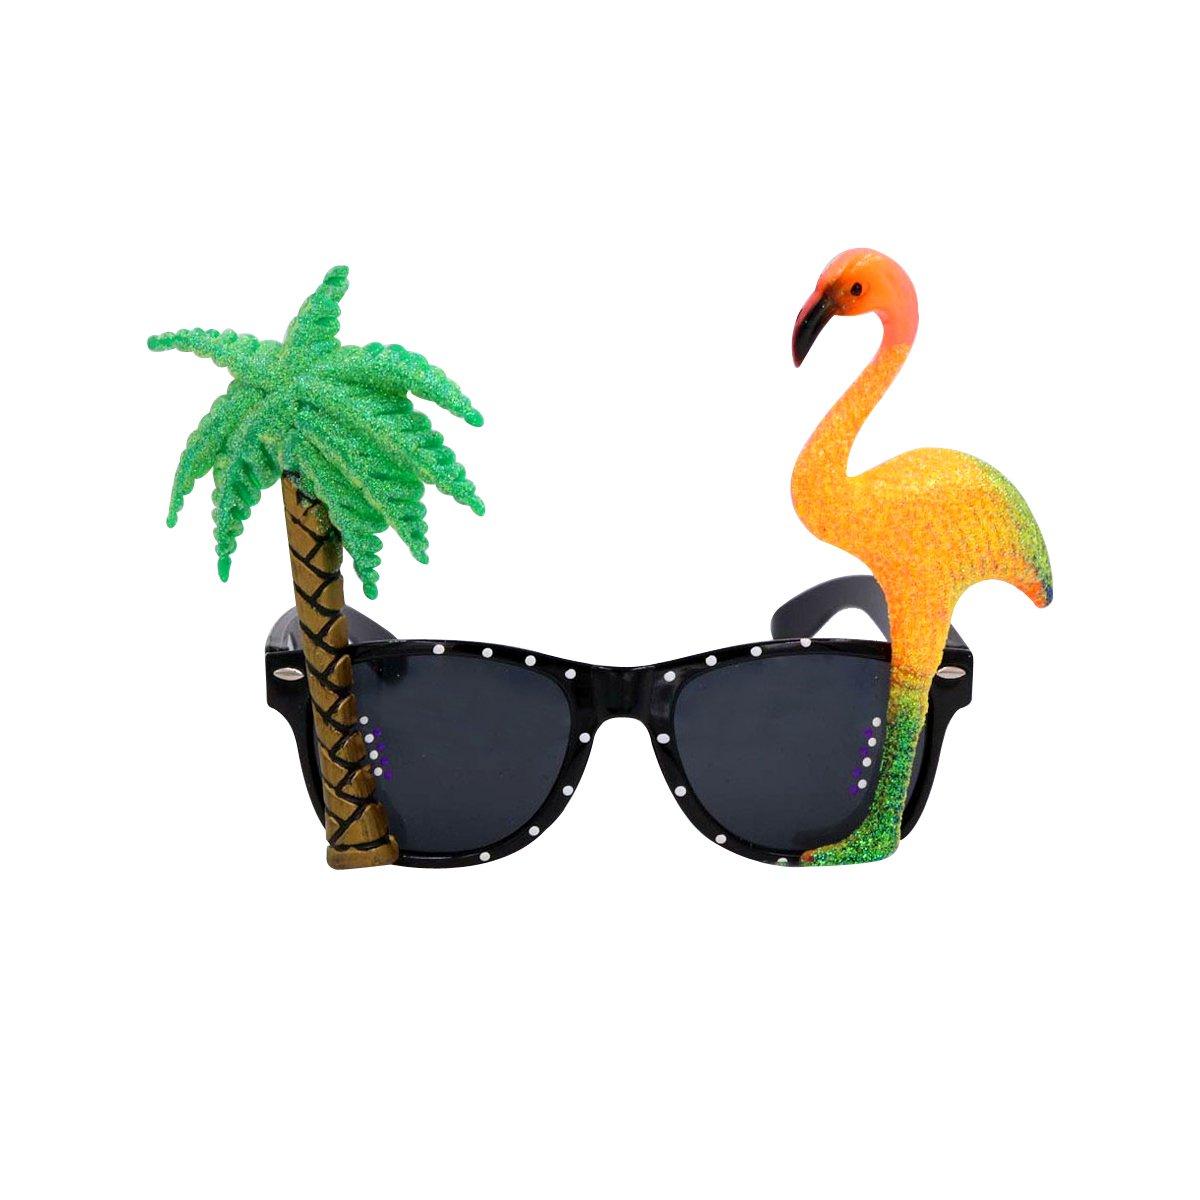 04afaa35e2 Bestoyard flamingo sunglasses palm tree sunglasses tropical hawaii luau  sunglasses for beach summer party toys games